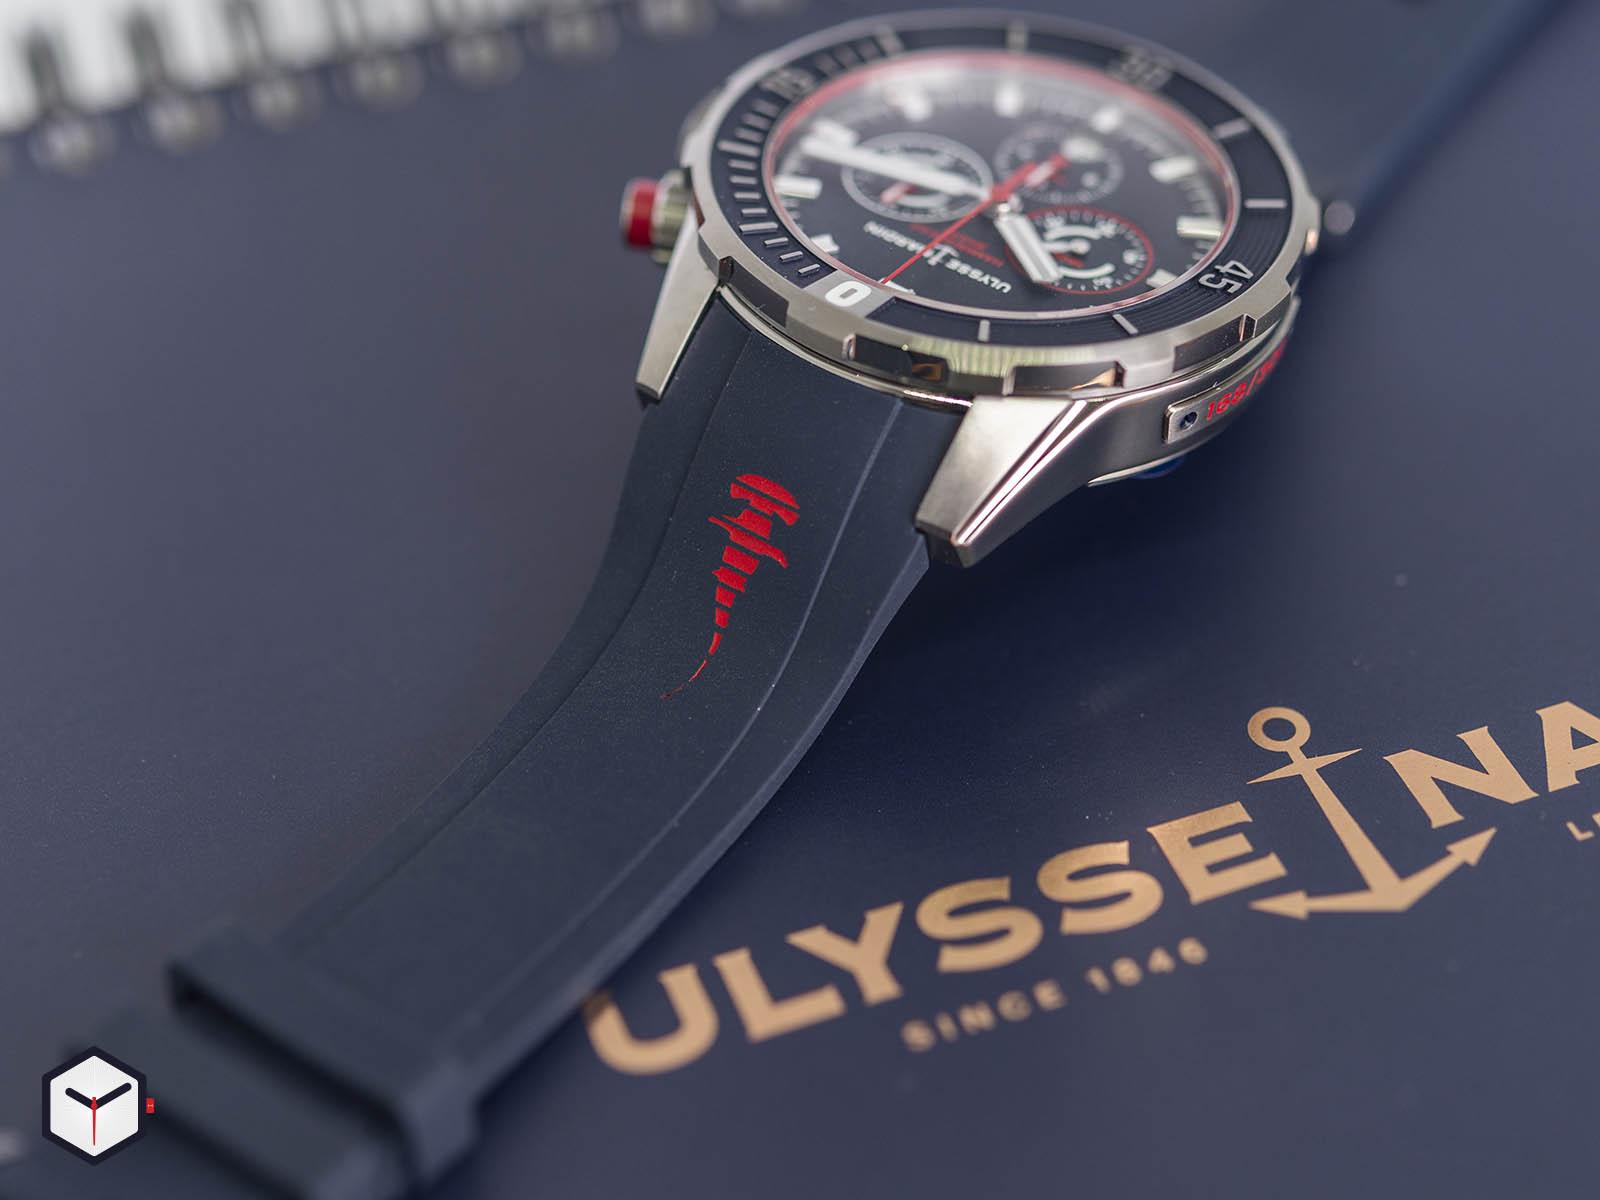 1503-170le-3-93-hammer-ulysse-nardin-diver-chronograph-44mm-hammerhead-shark-3.jpg